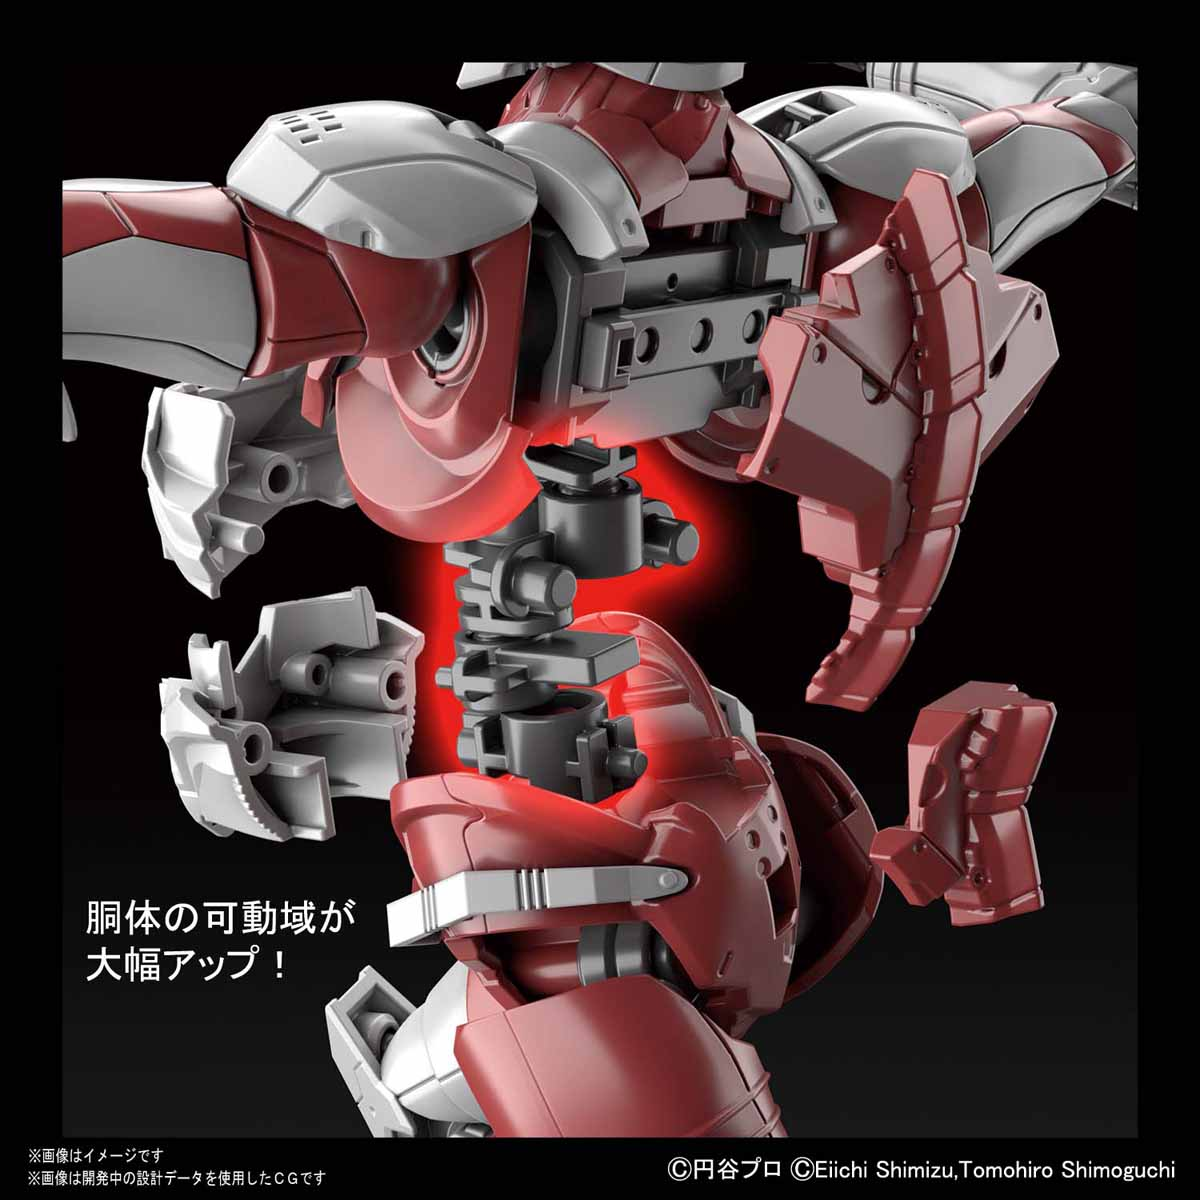 Figure-rise Standard『ULTRAMAN [B TYPE] -ACTION-』ウルトラマンスーツ 1/12 プラモデル-006